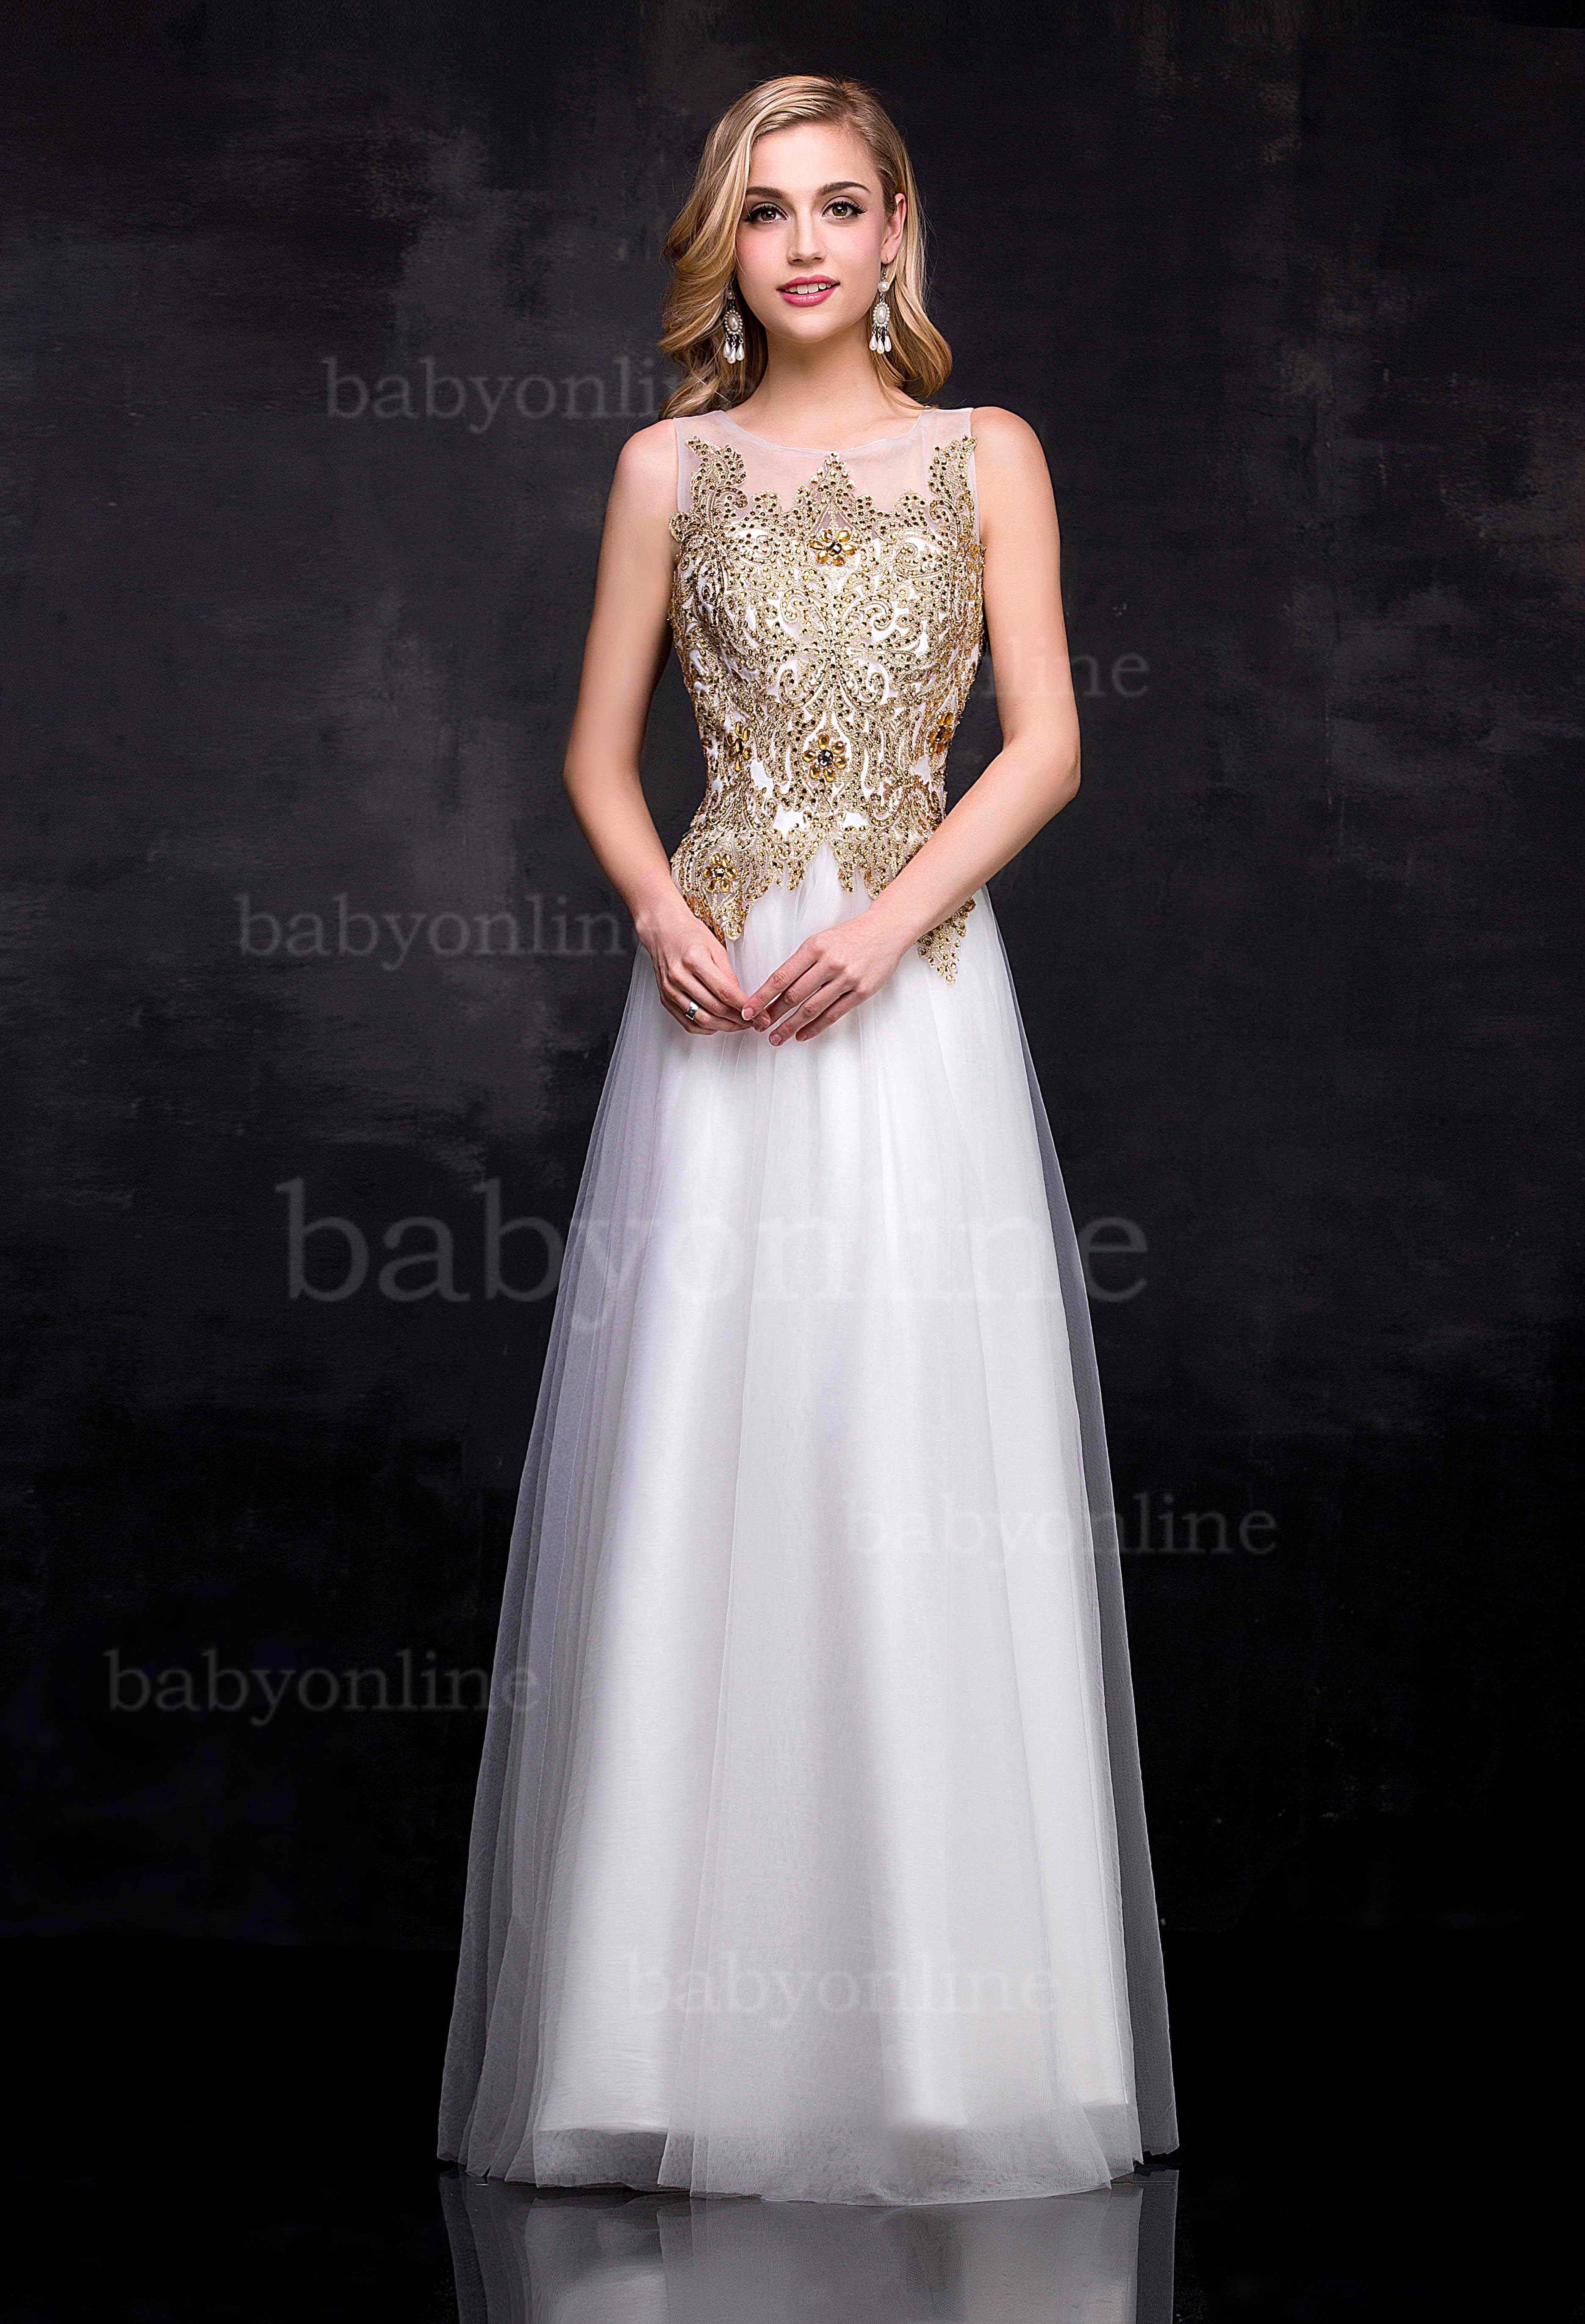 Prom Dress Shops In Greenville Sc - Ocodea.com